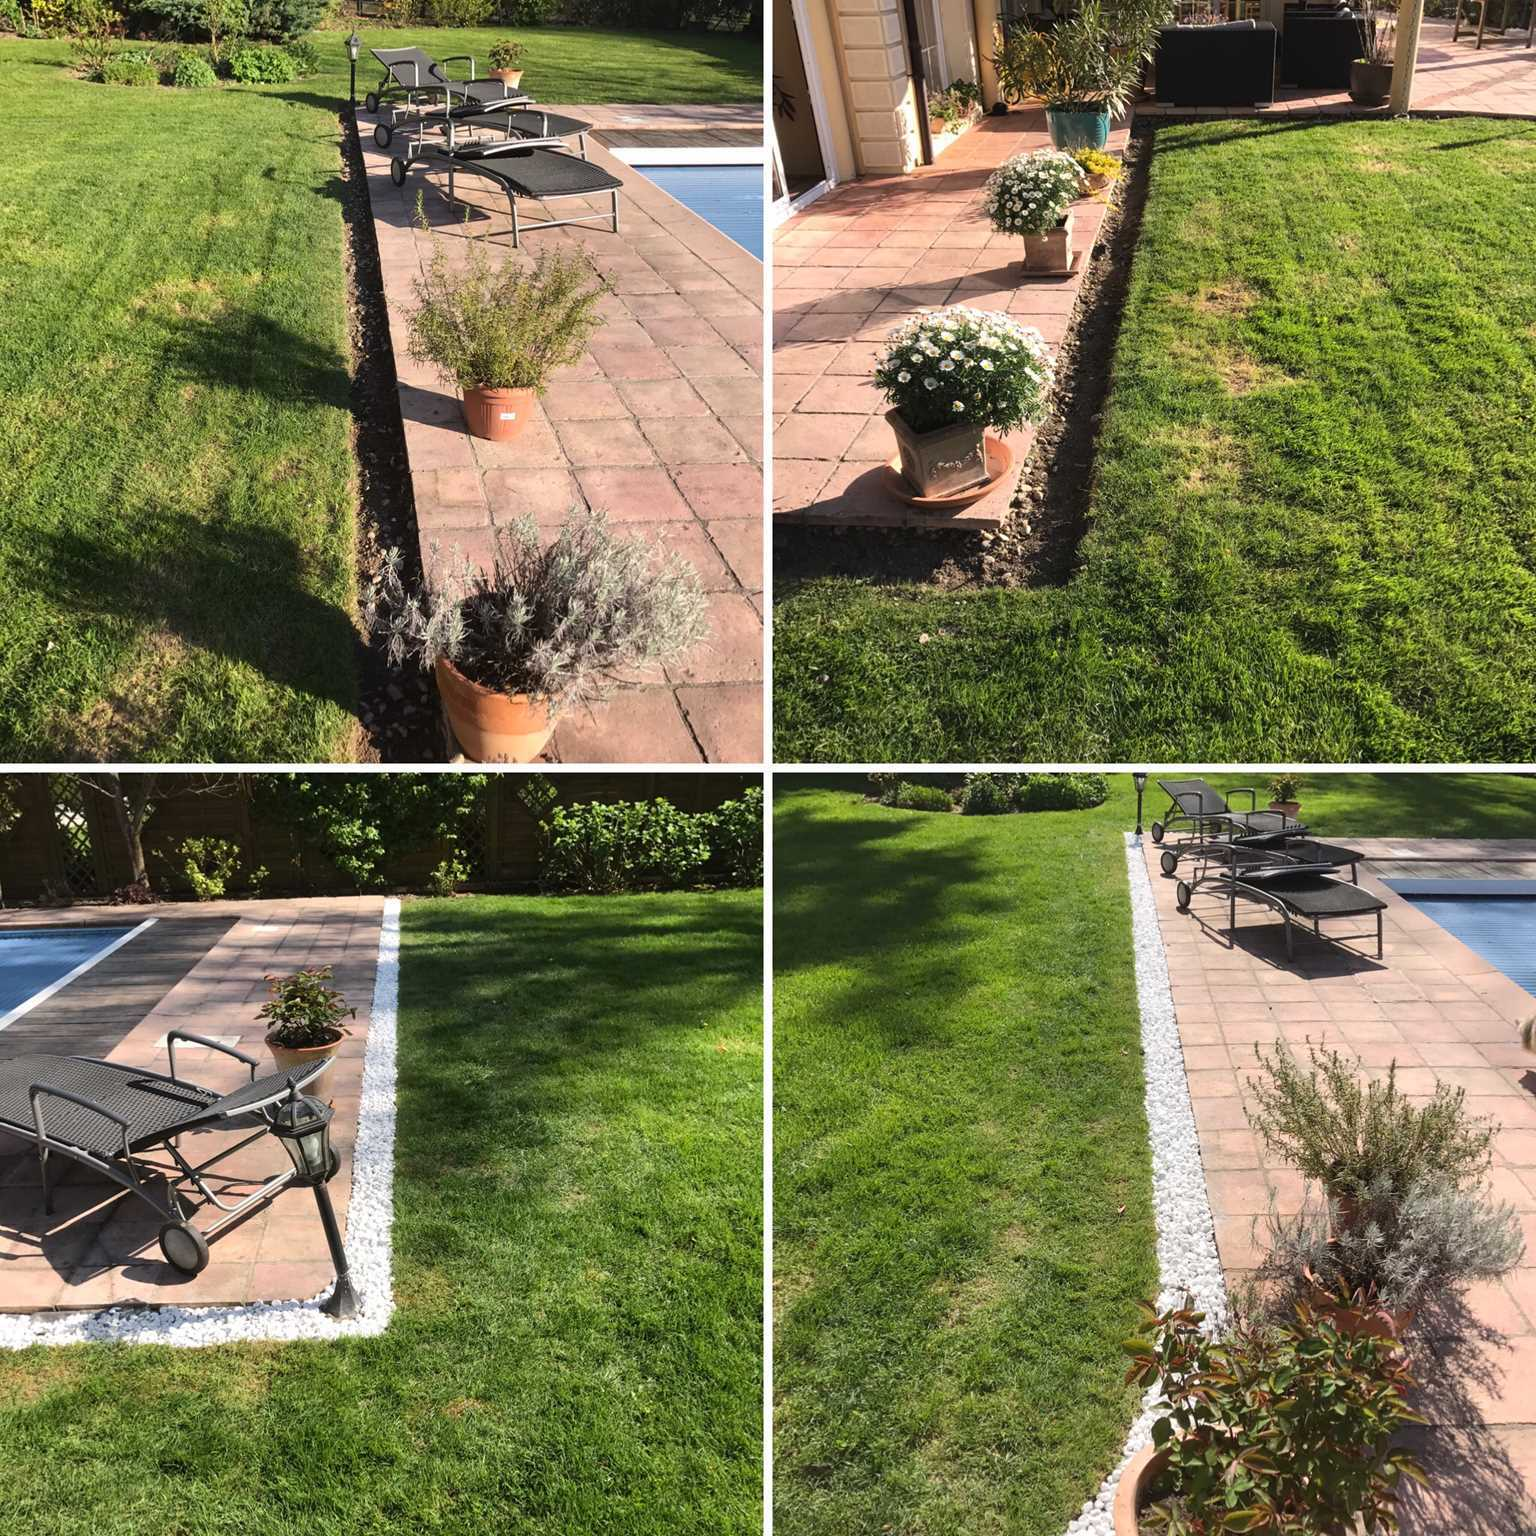 Parvex paysagiste entretien de jardins parcs potager for Entretien jardin 94